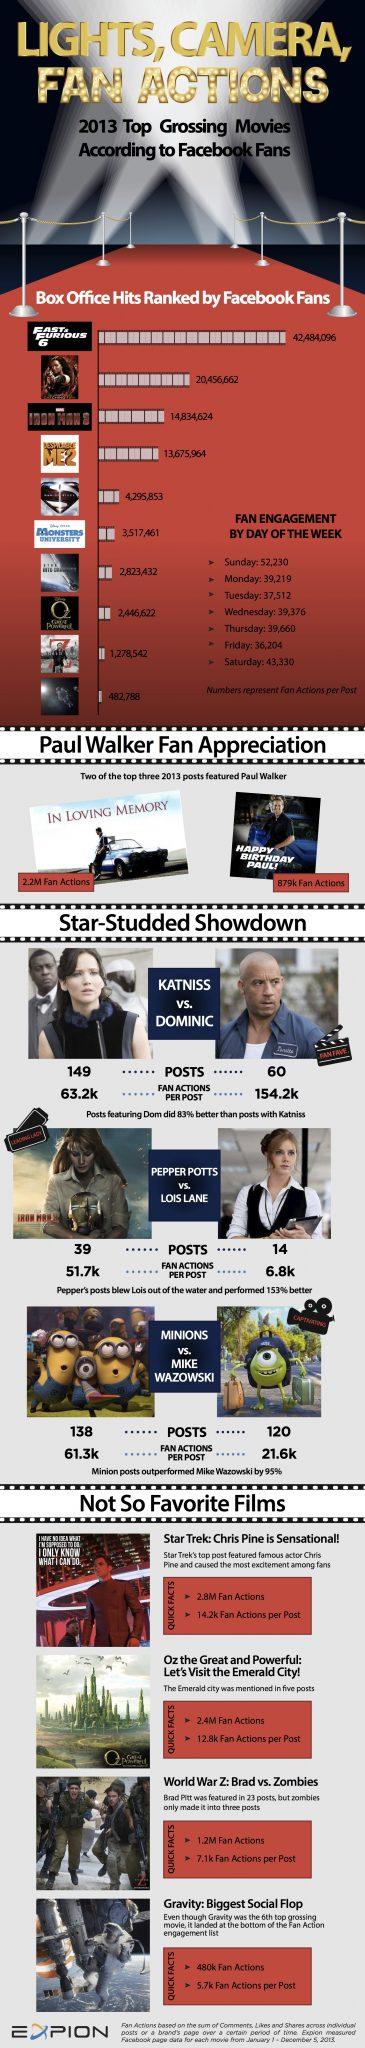 2013-Movies-by-Facebook_Expion